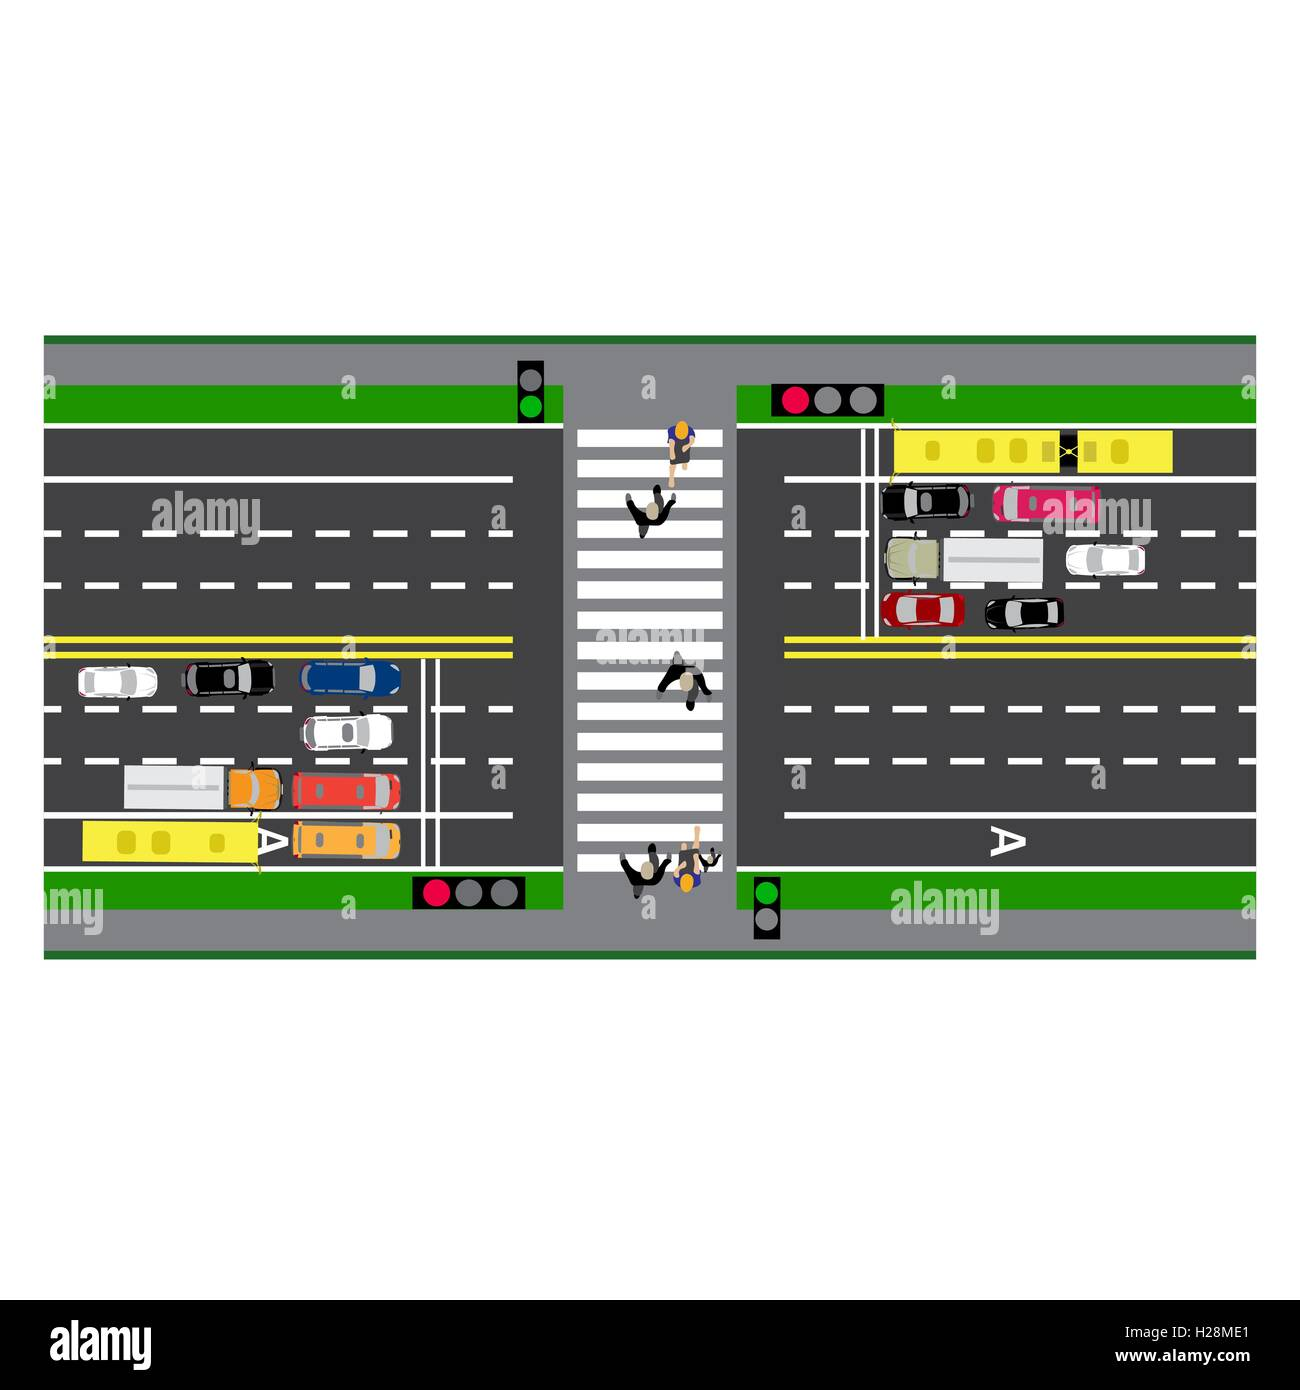 City Street Map Diagram Stockfotos & City Street Map Diagram Bilder ...